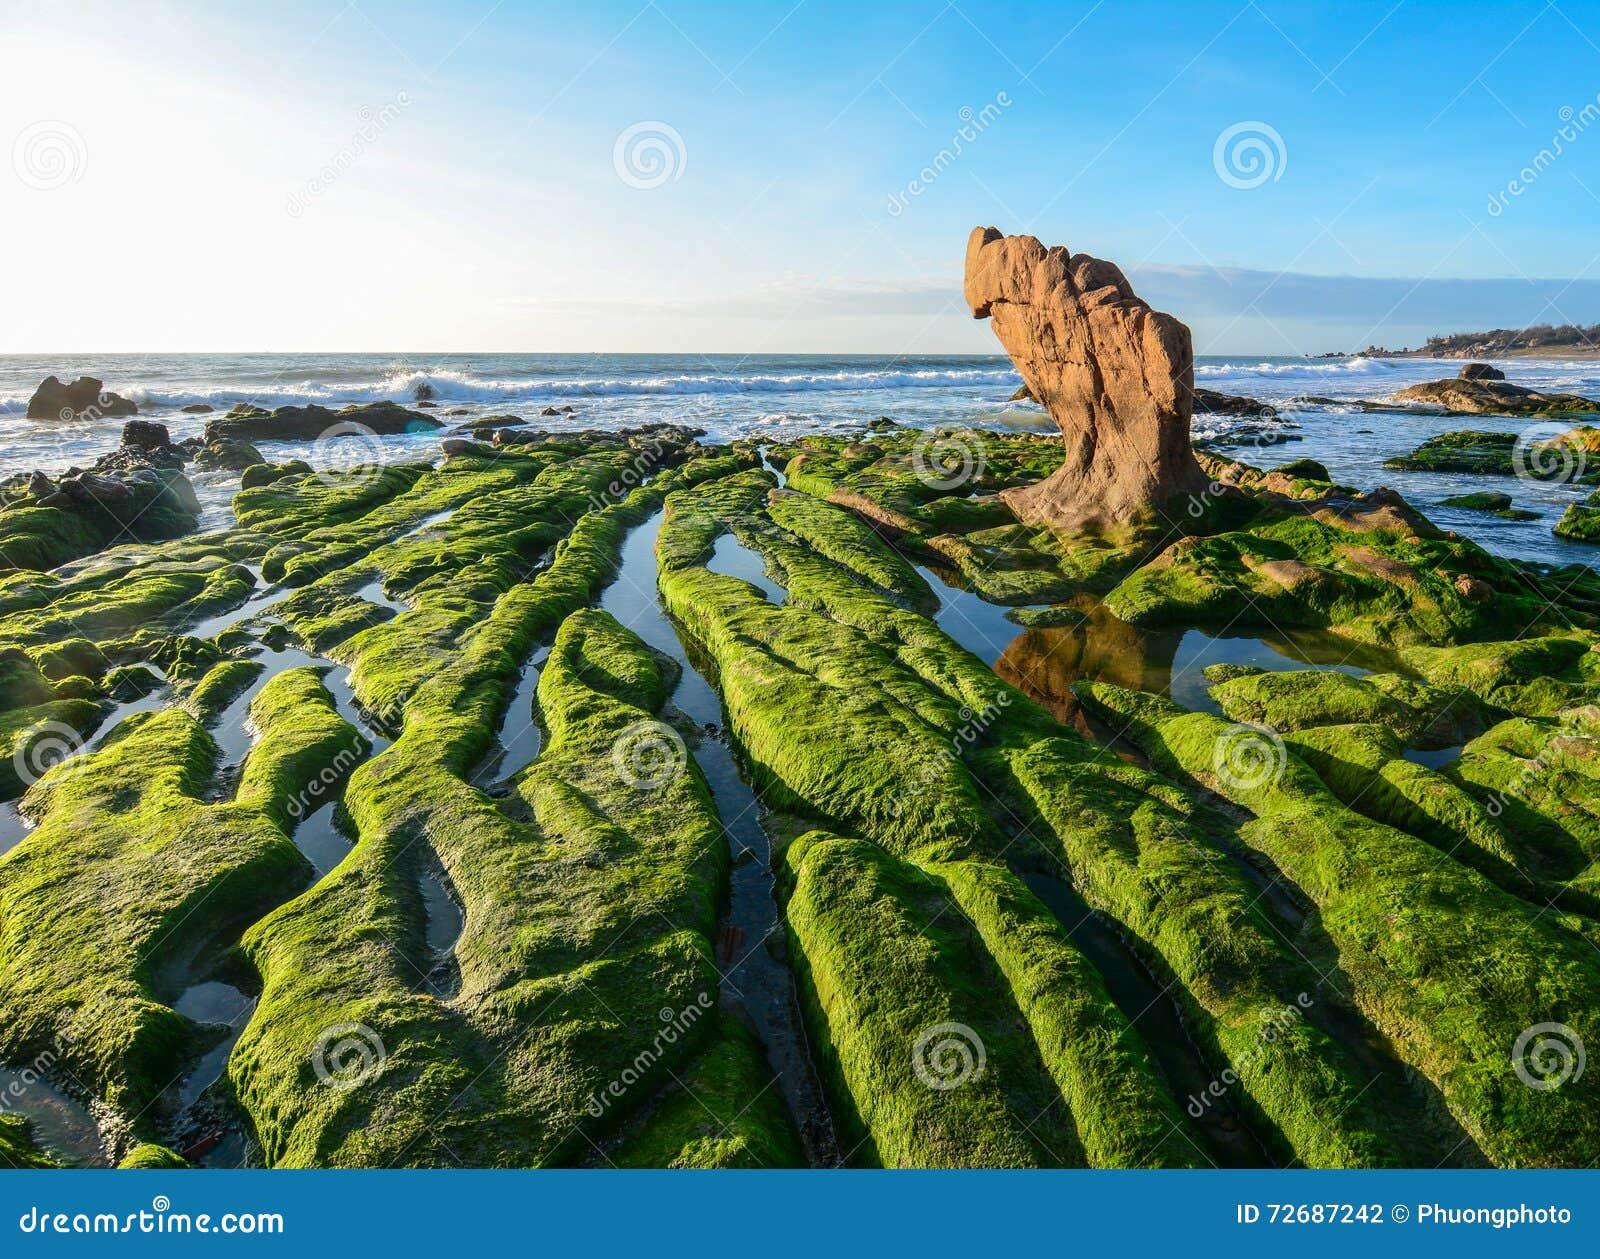 co thach beach with the rocks in ninh thuan  vietnam stock clip art rocket ship clip art rocking horse